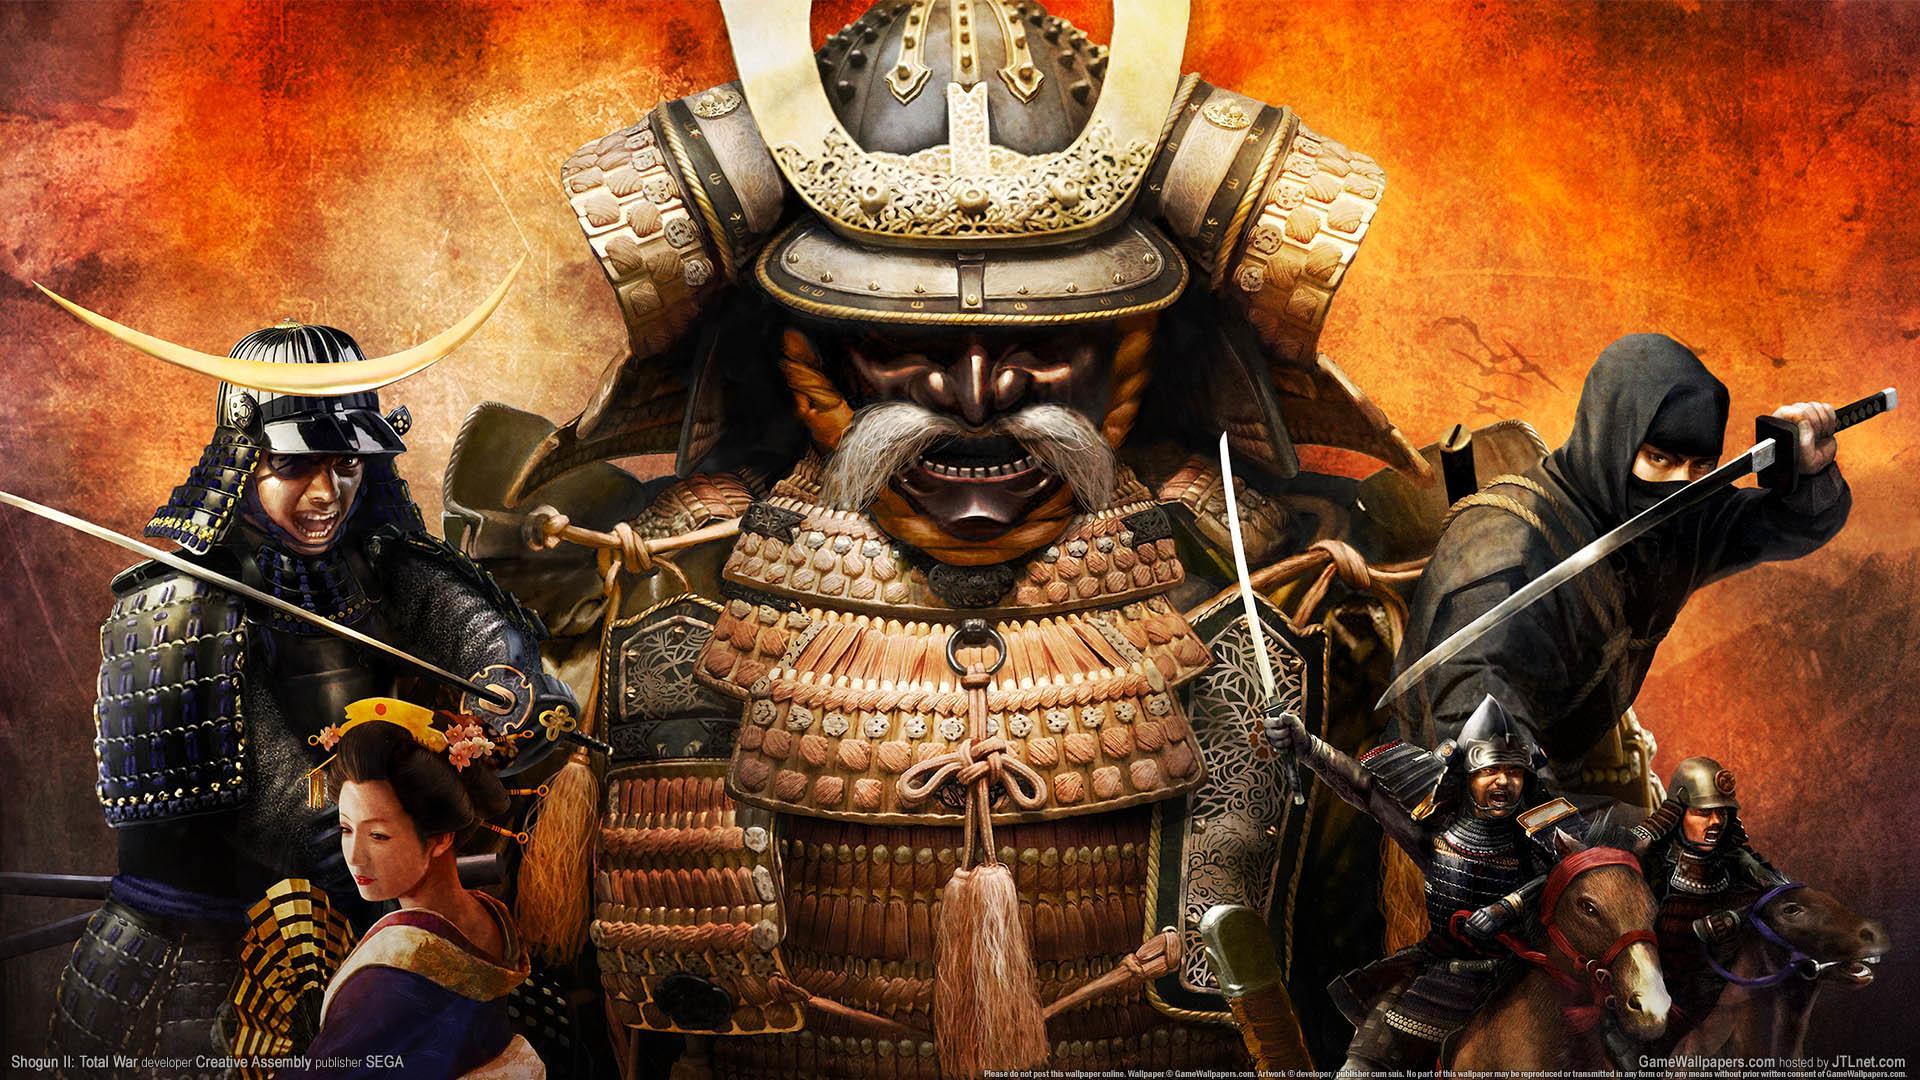 Shogun Total War wallpapers HD quality